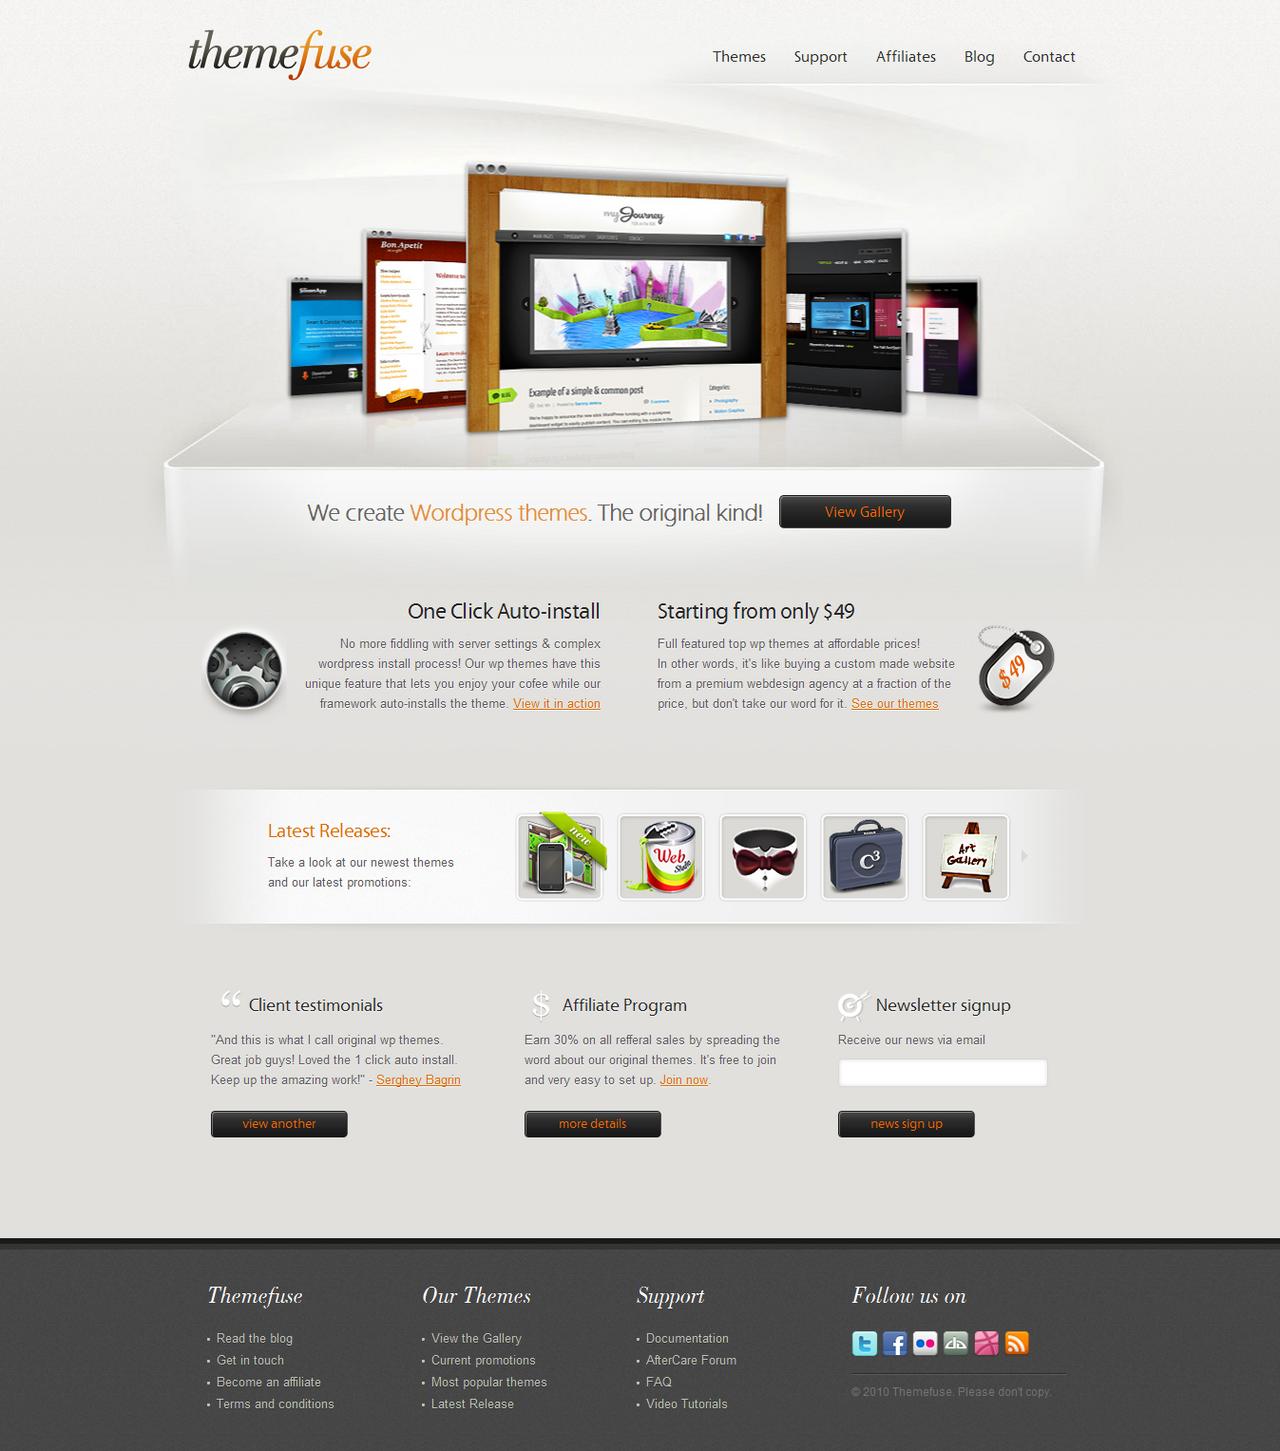 ThemeFuse - Original WP Themes by ThemeFuse